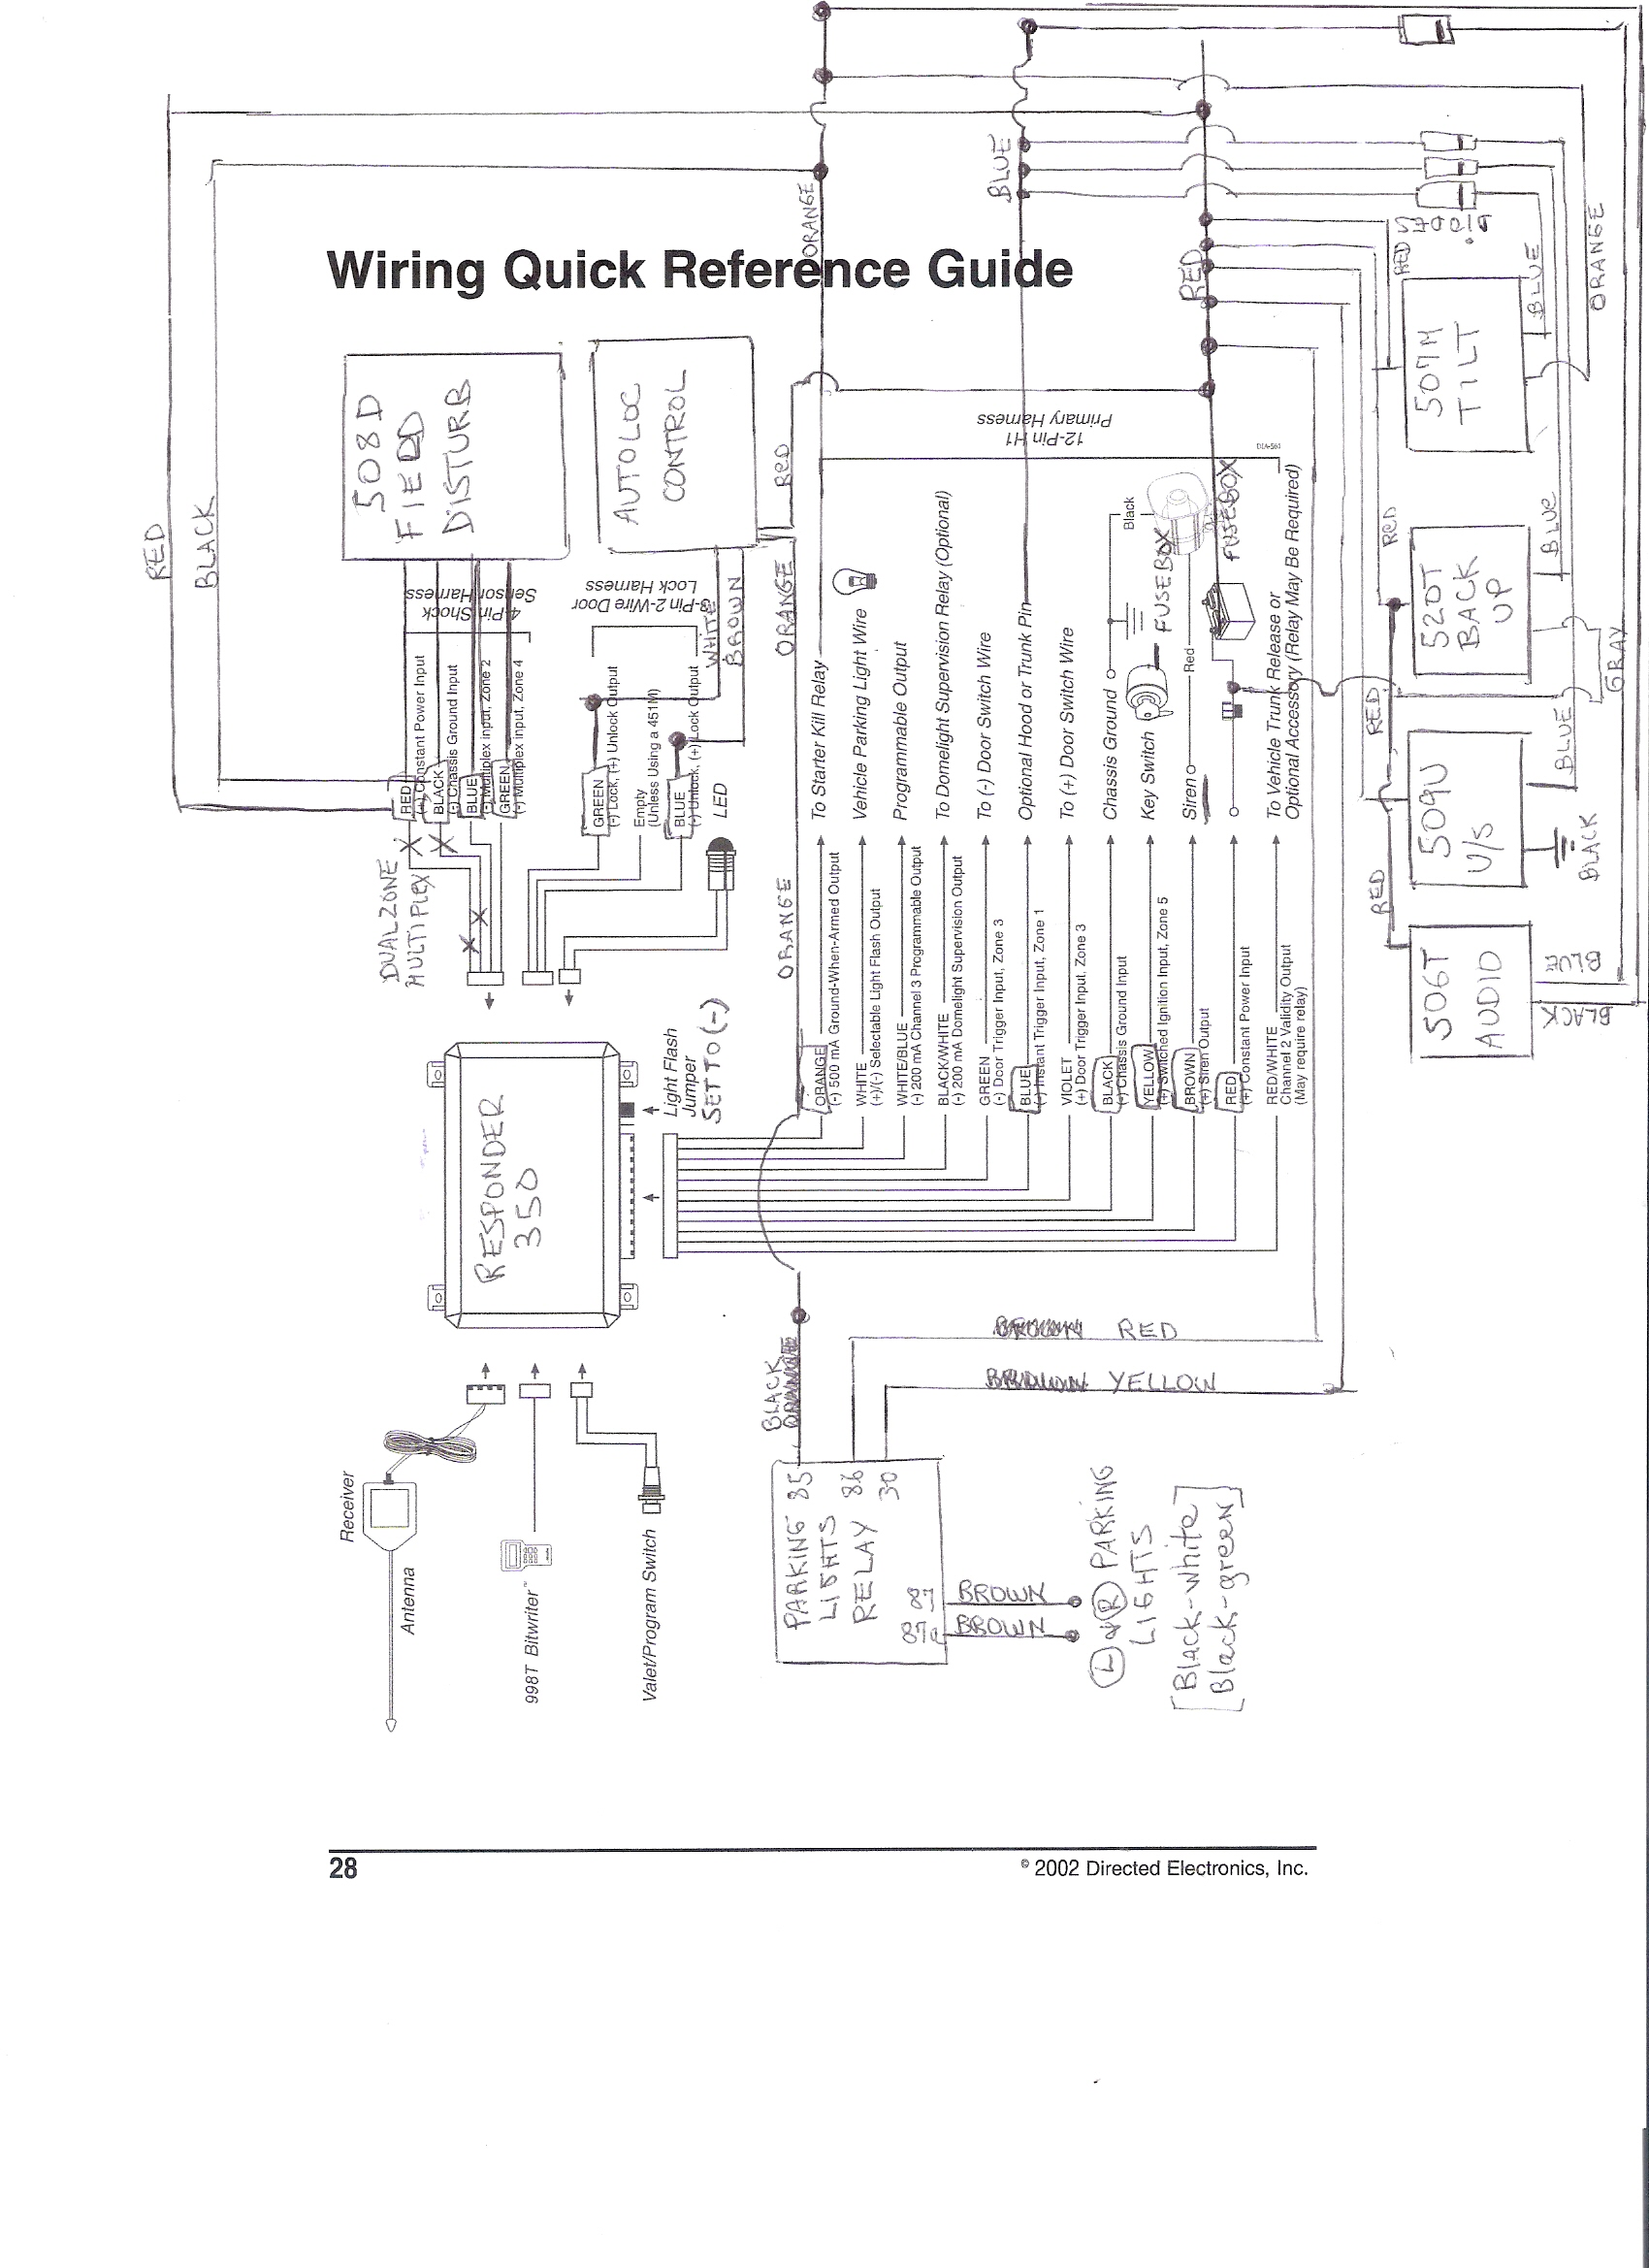 wiring diagram 1989 land rover defender